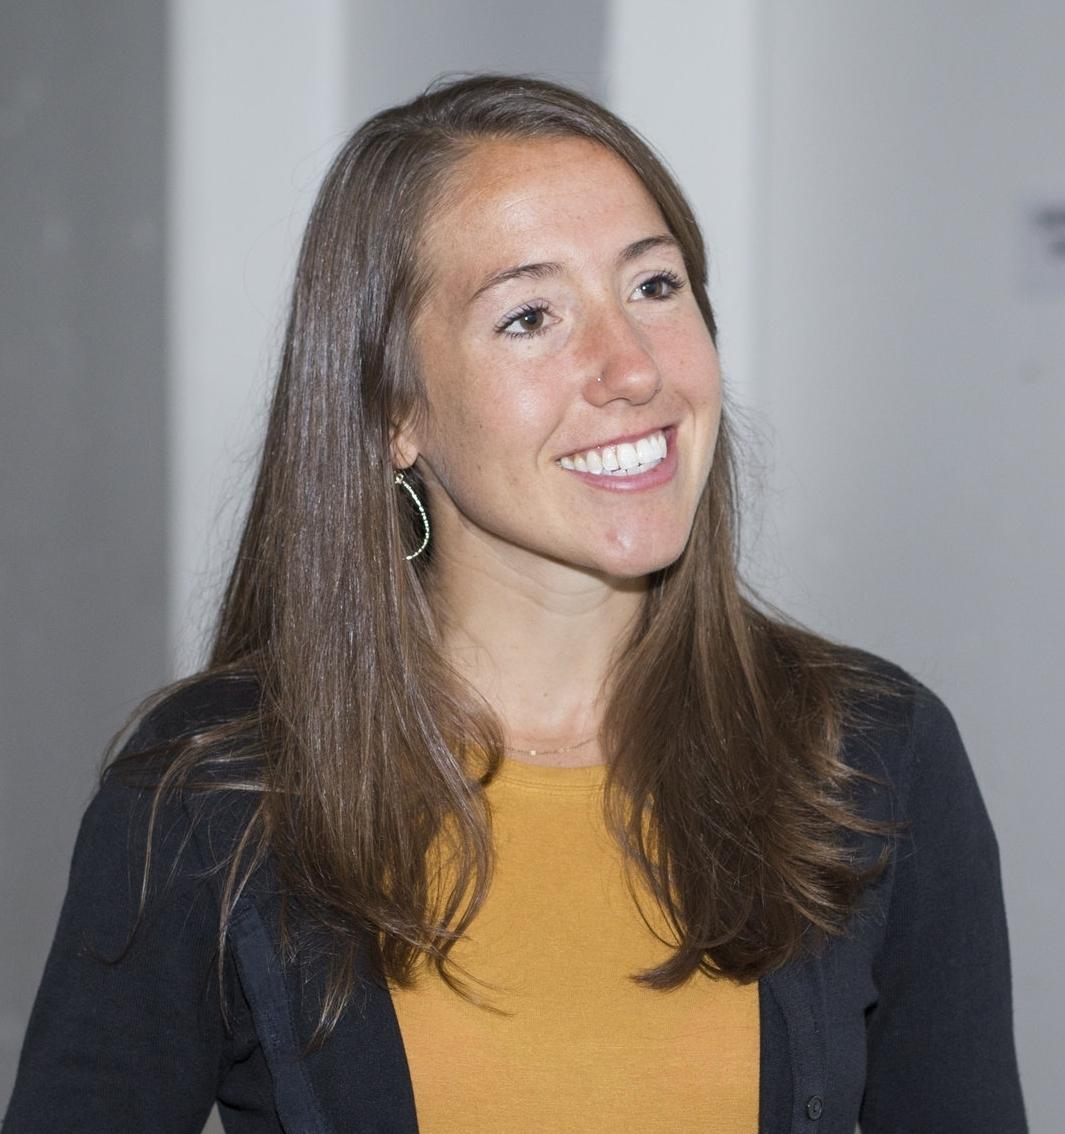 Rena Satre Meloy - Pausemeditation.org